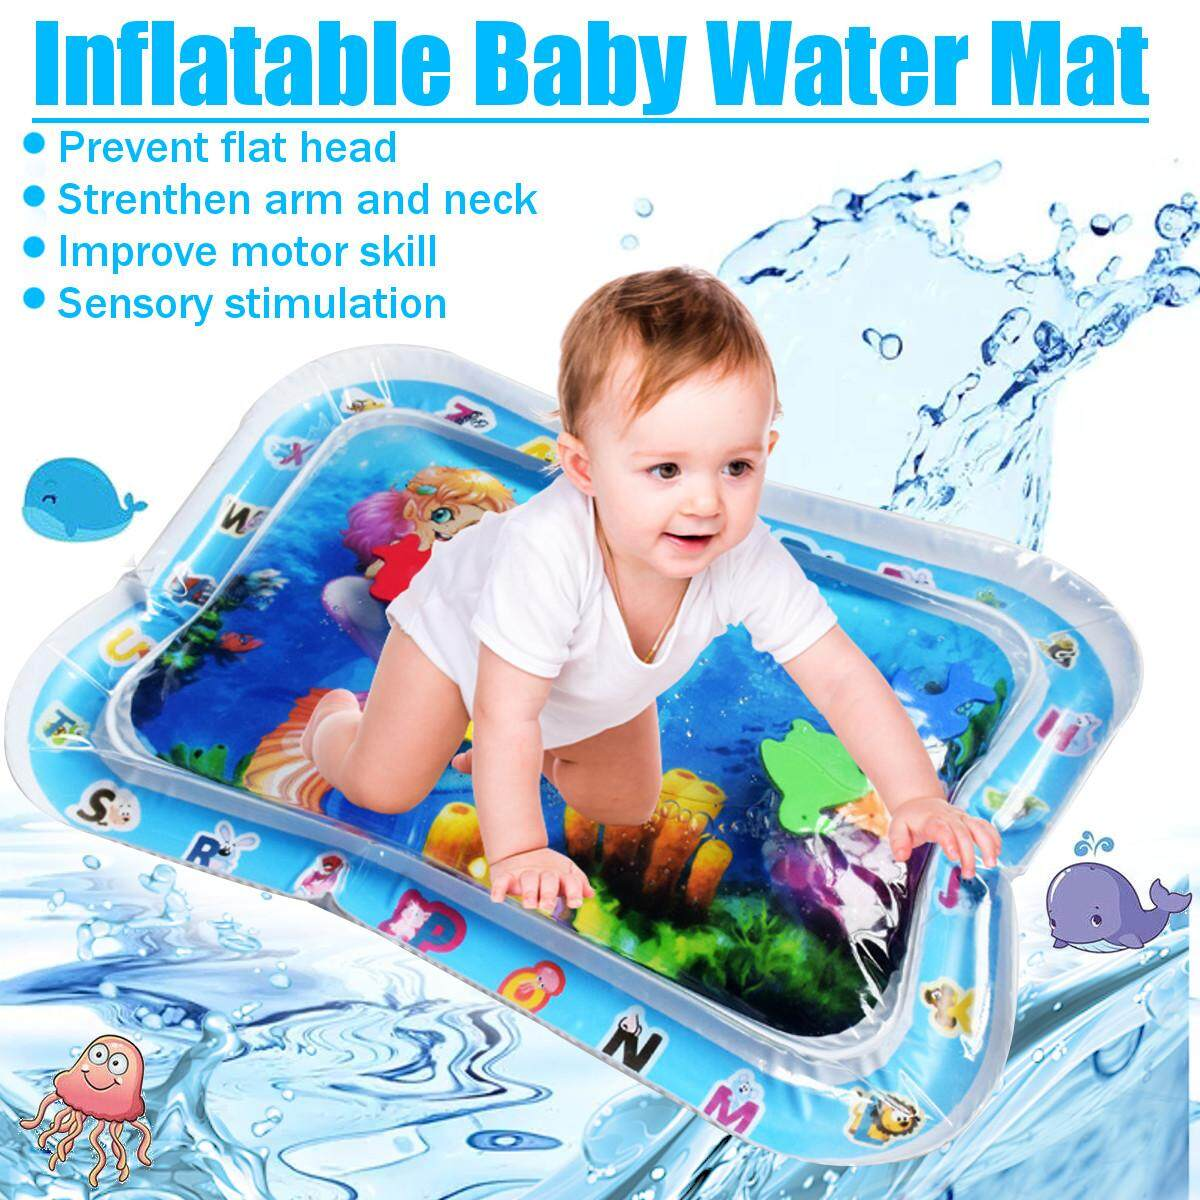 Air Tikar Bermain Inflatable Bayi Balita Menyenangkan Perut Waktu Aktivitas Pusat By Freebang.